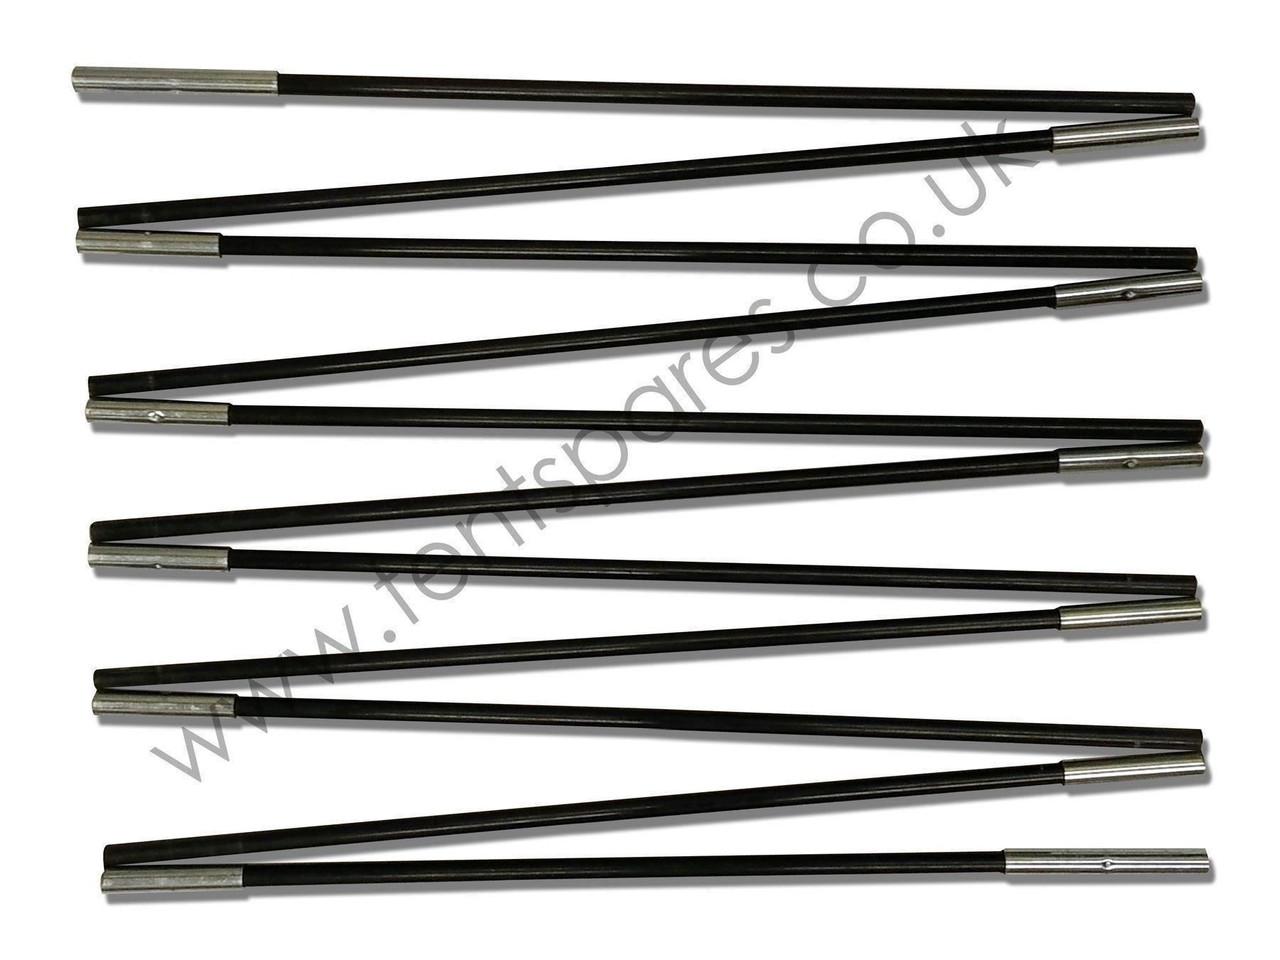 5c3ab156425 Vango Mambo 300 Black Fibreglass Main Pole 2017 - Tentspares Ltd